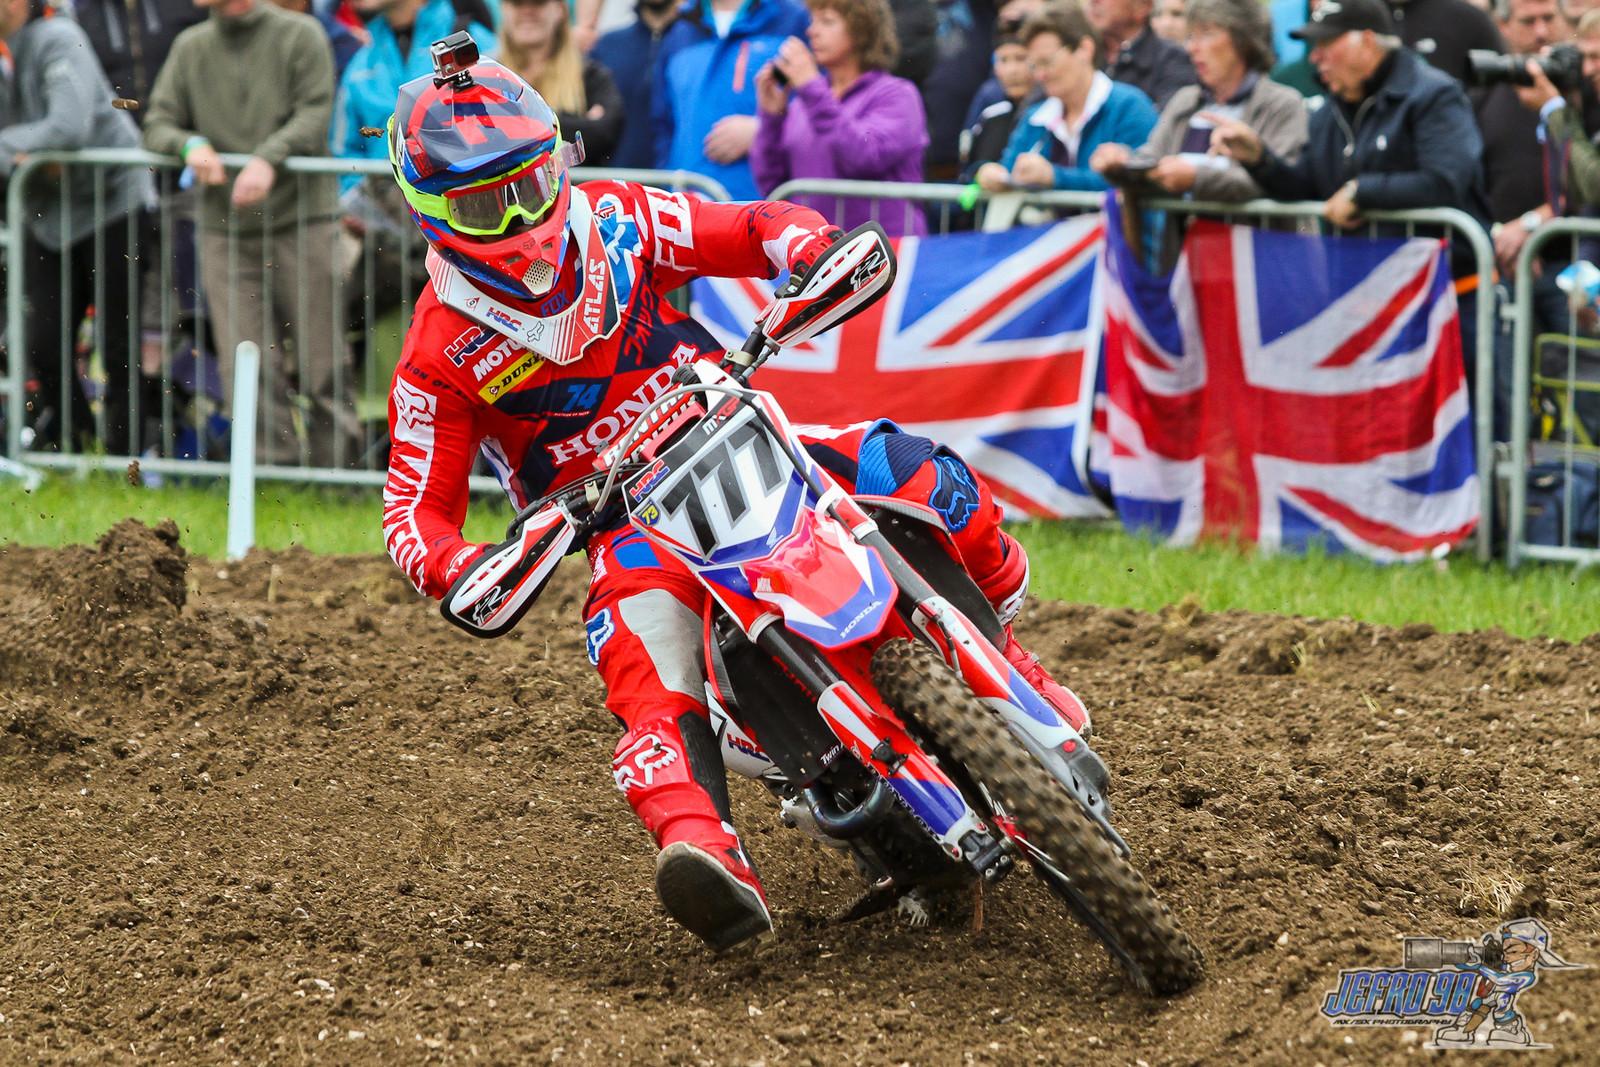 Evgeny Bobryshev - Photo Gallery: MXGP of Great Britain - Motocross Pictures - Vital MX